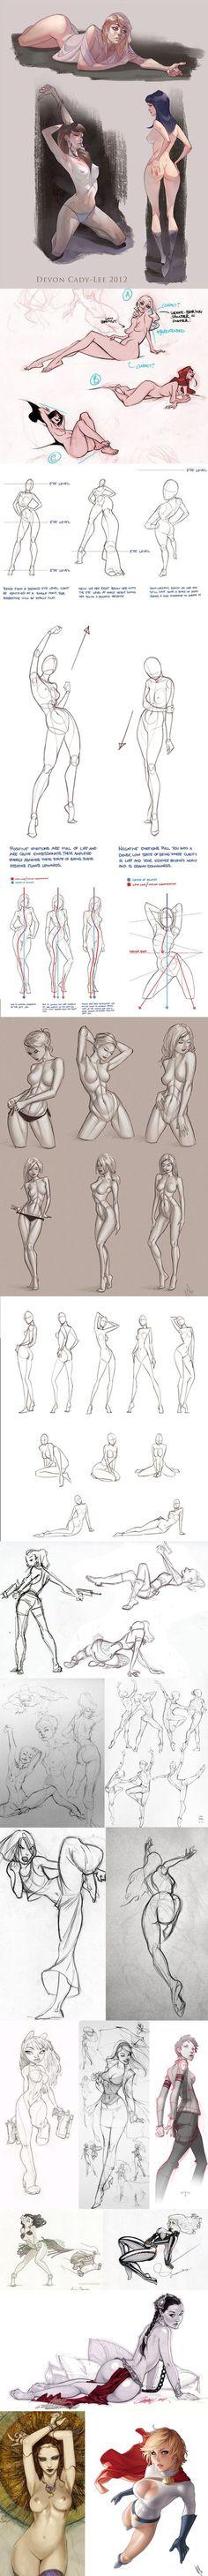 Anatomia Feminina, estudos e poses.